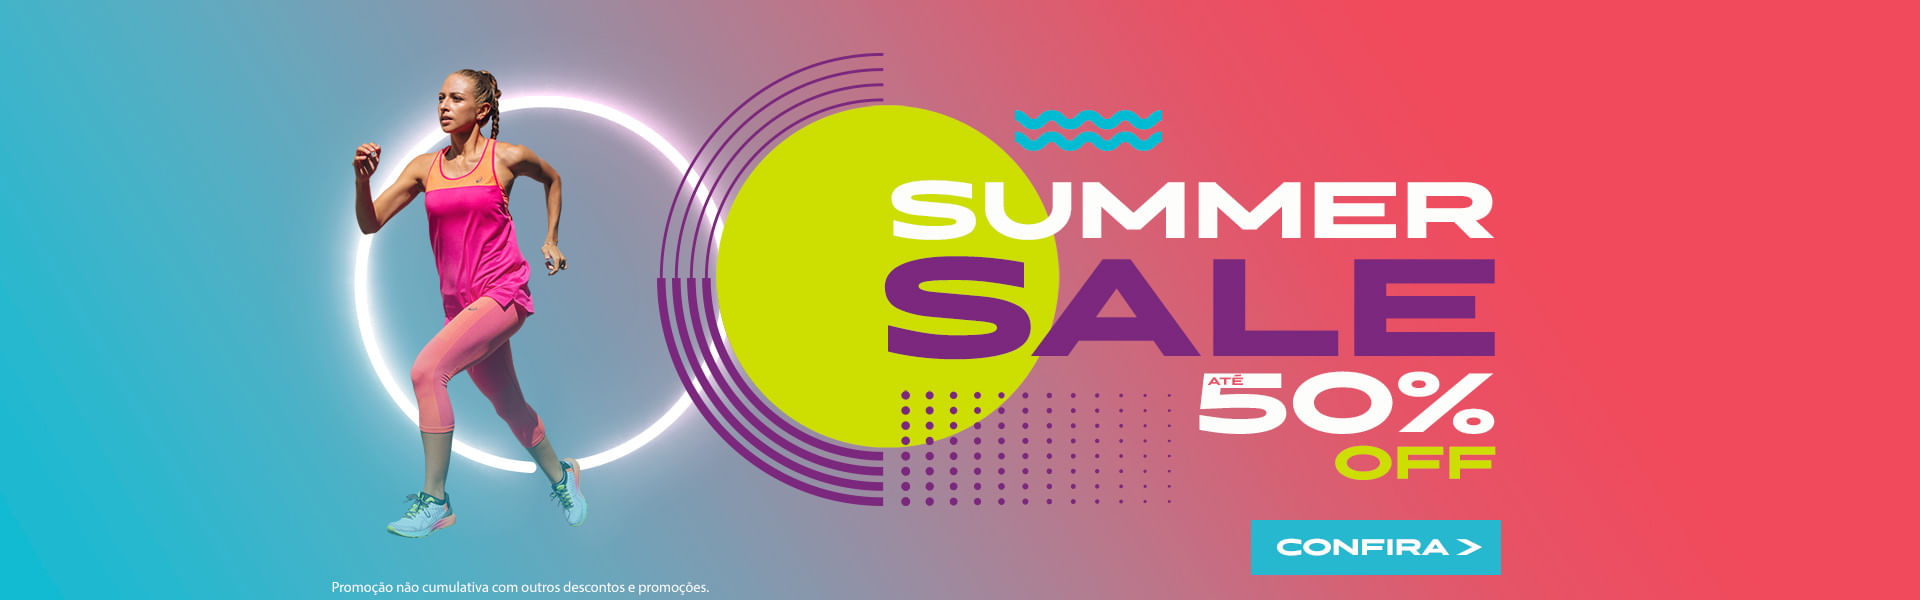 Campanha-Summer-Sale-ASICS